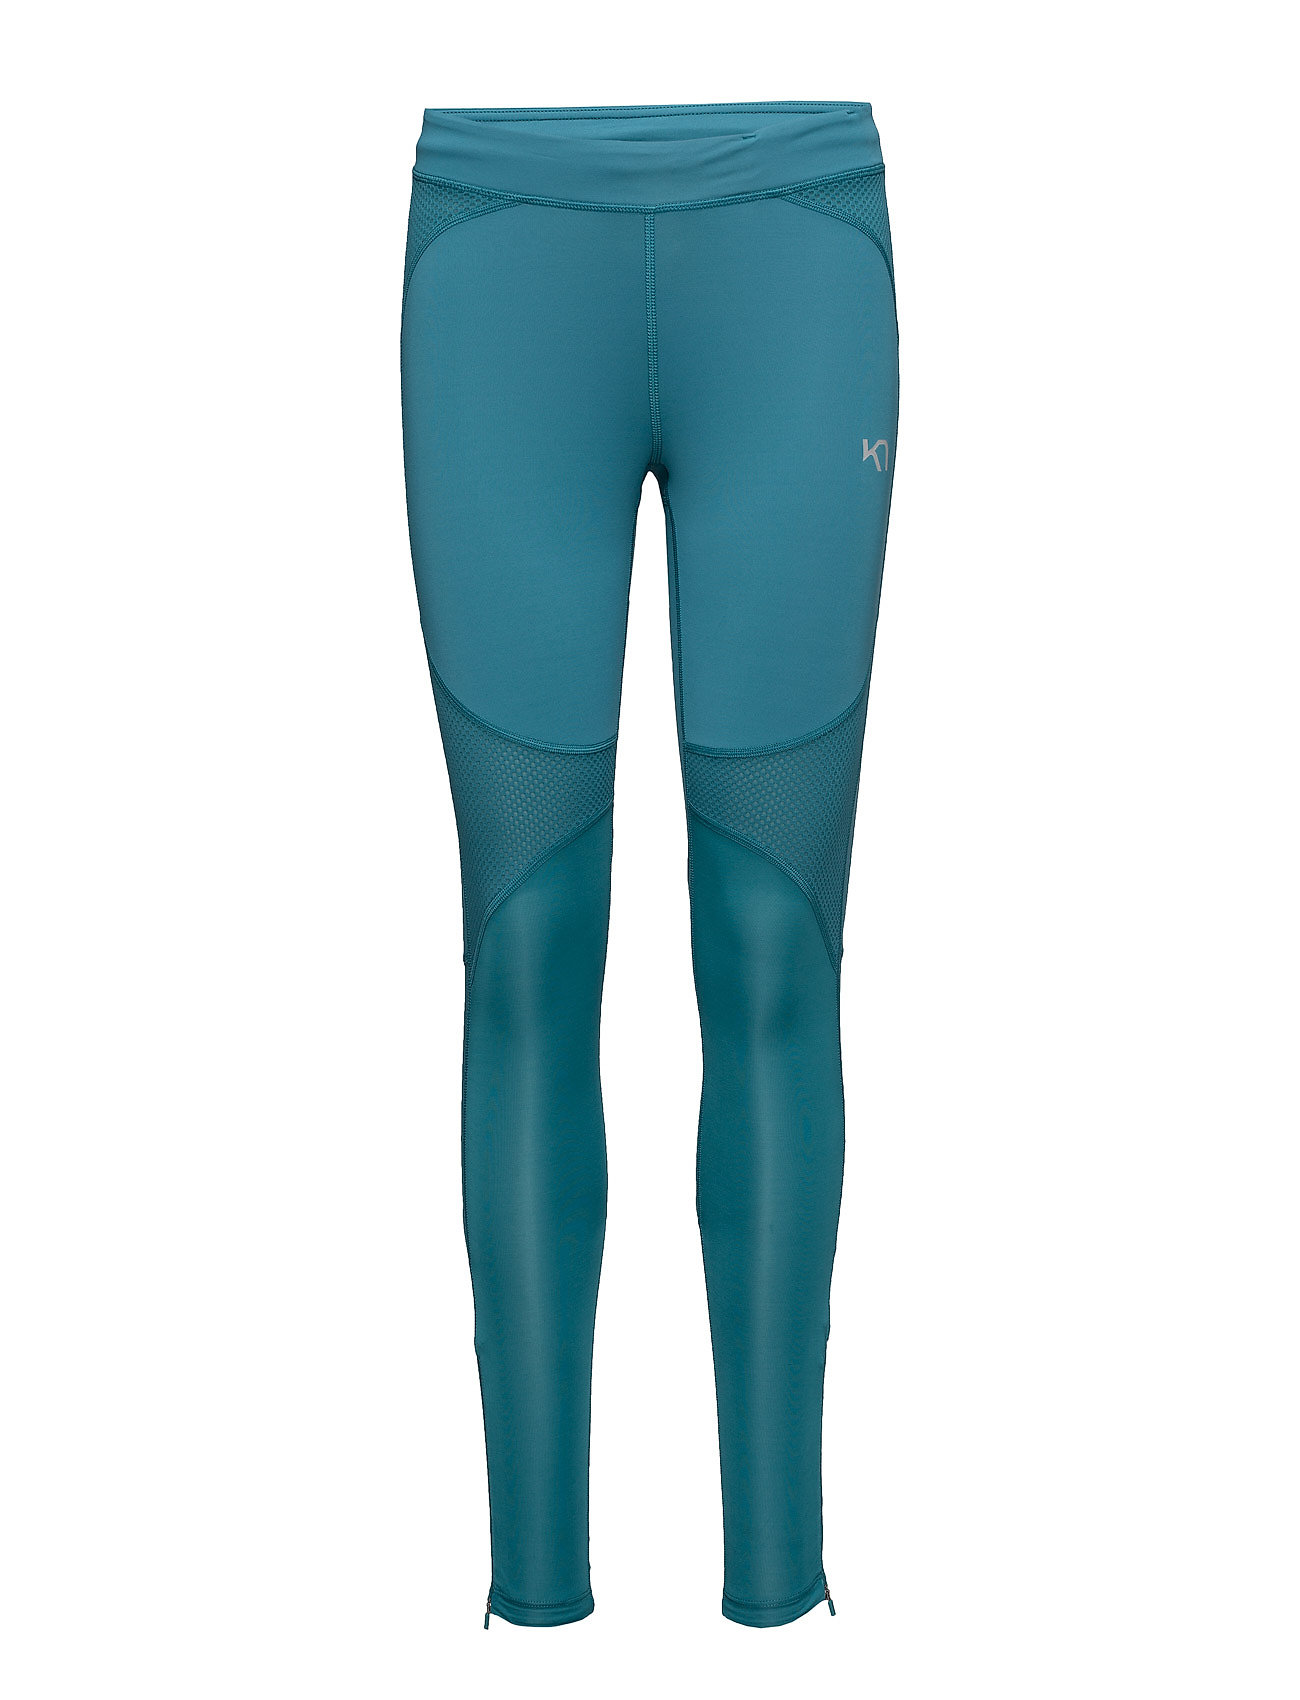 Lina Tights Kari Traa Trænings leggings til Kvinder i